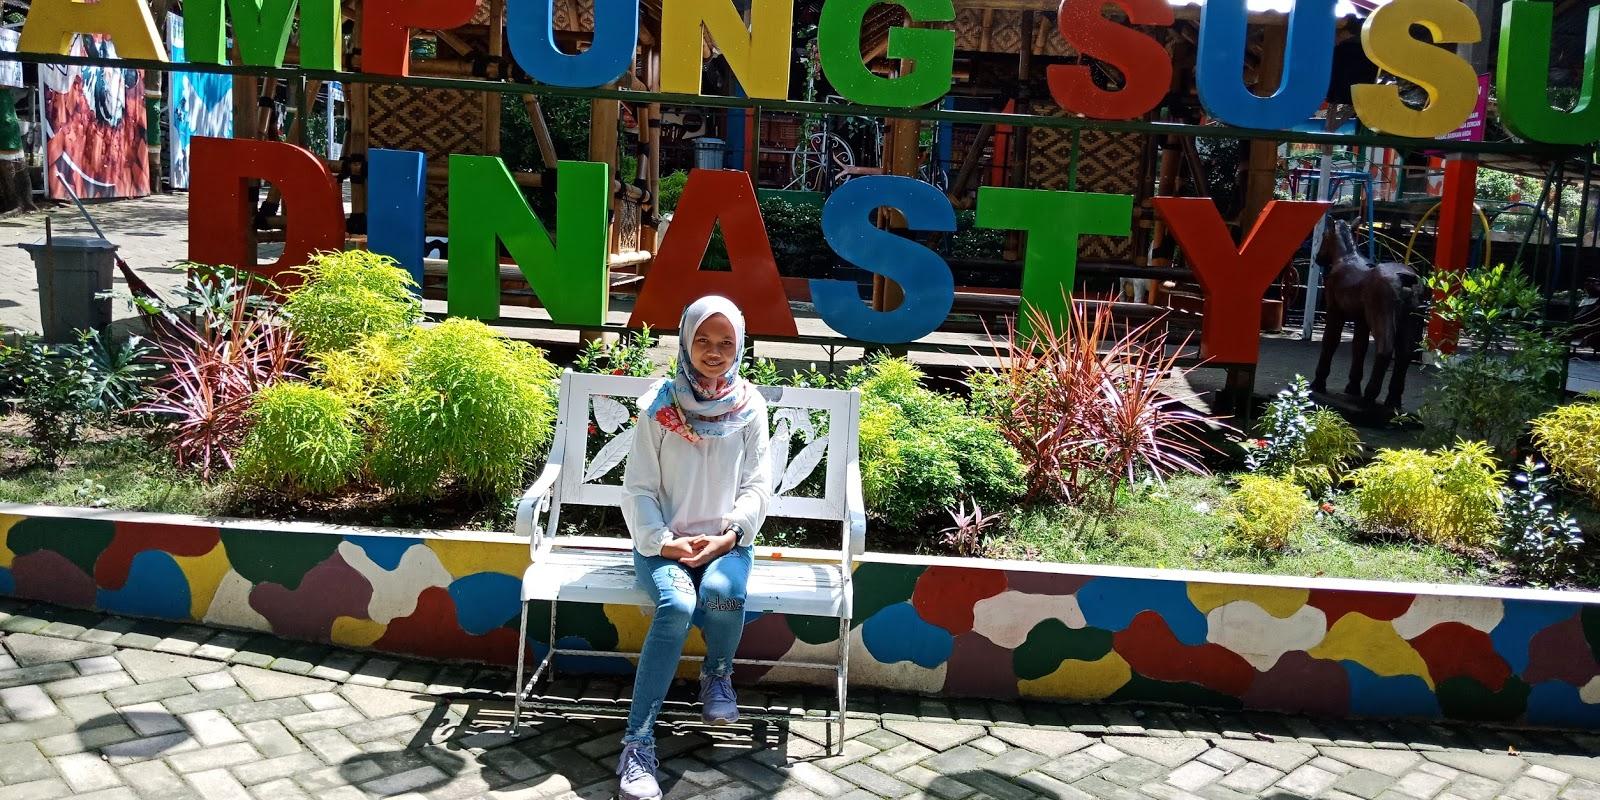 Traveling Kampung Susu Dinasti Ksd Lokasi Wisata Edukasi Dinasty Berada